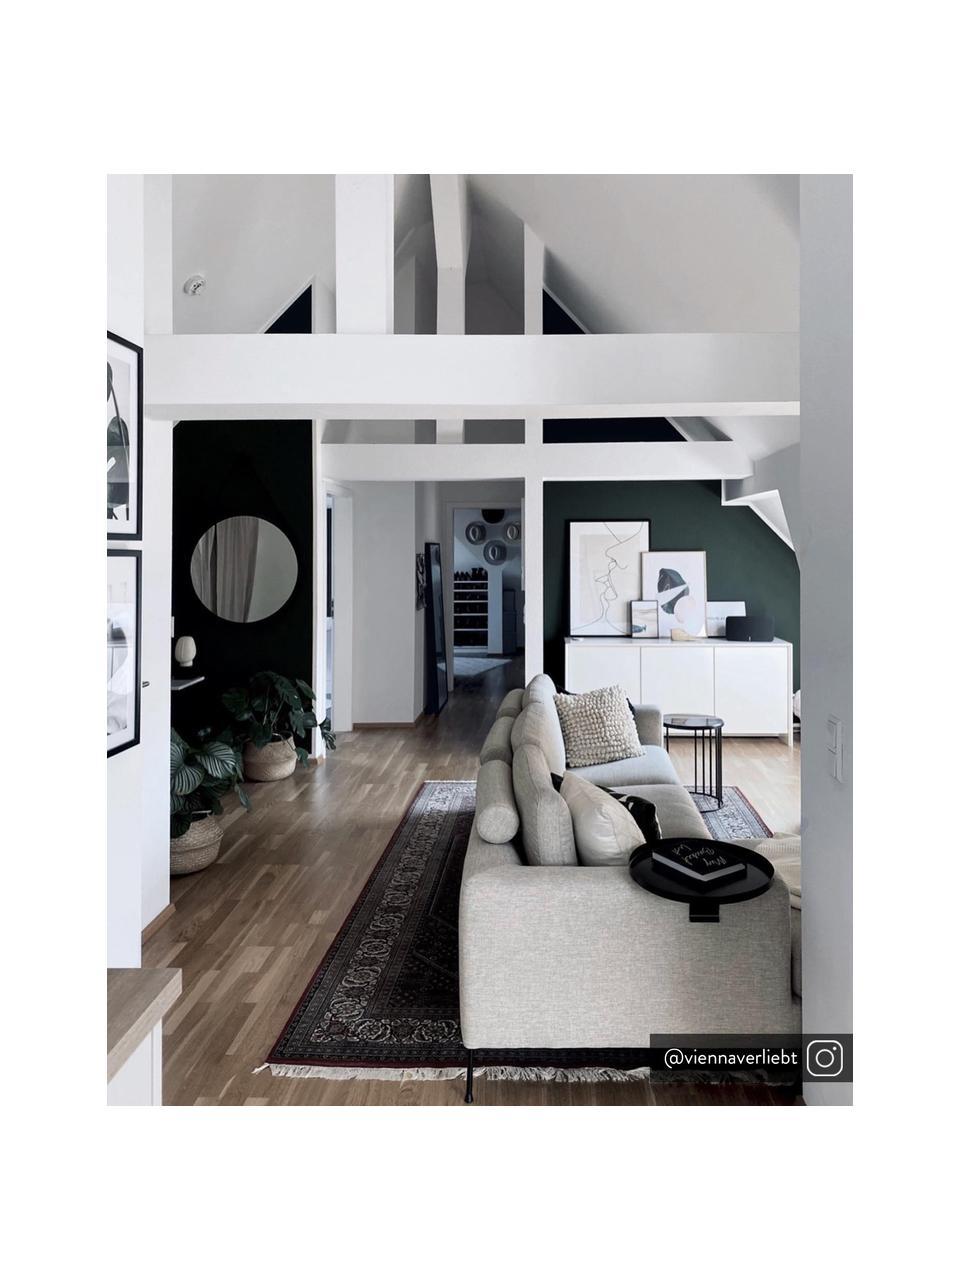 Sofá rinconero Cucita (4plazas), Tapizado: tejido (poliéster) Alta r, Estructura: madera de pino maciza, Patas: metal pintado, Tejido beige, An 302 x F 163 cm